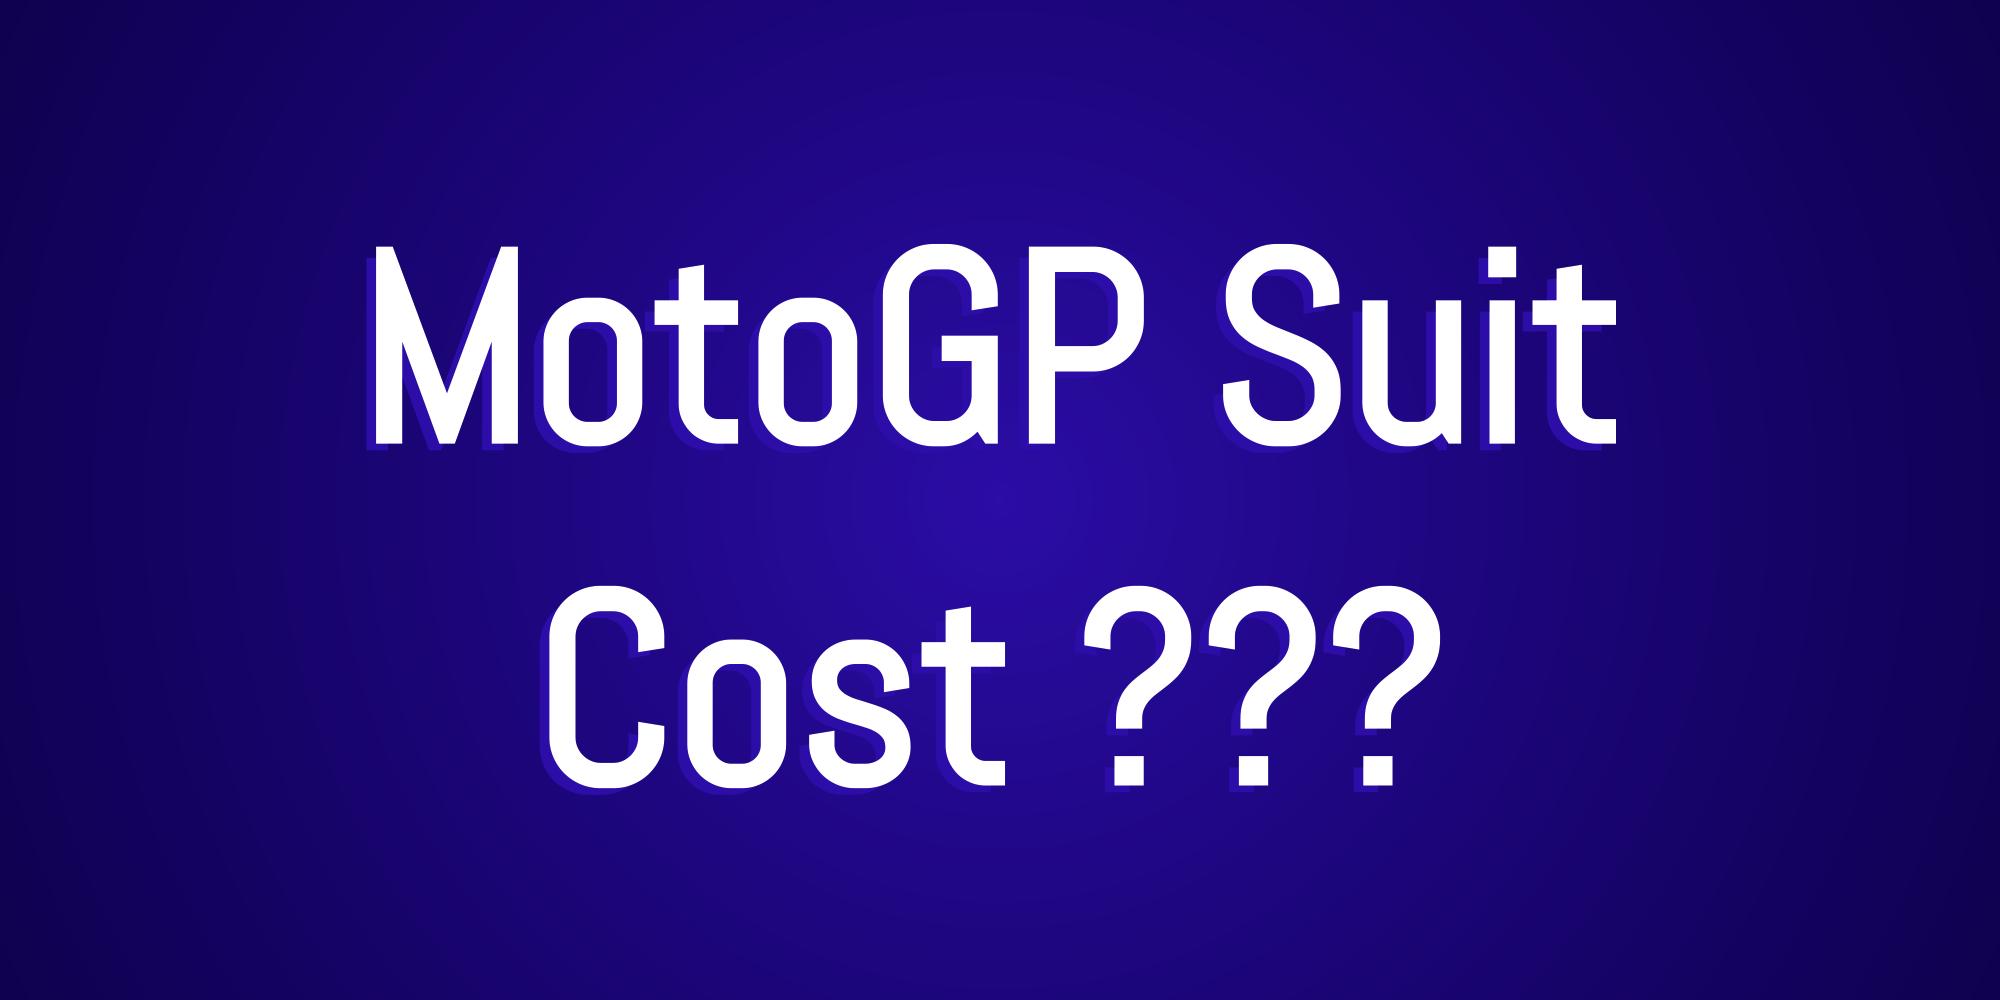 motogp-suit-cost